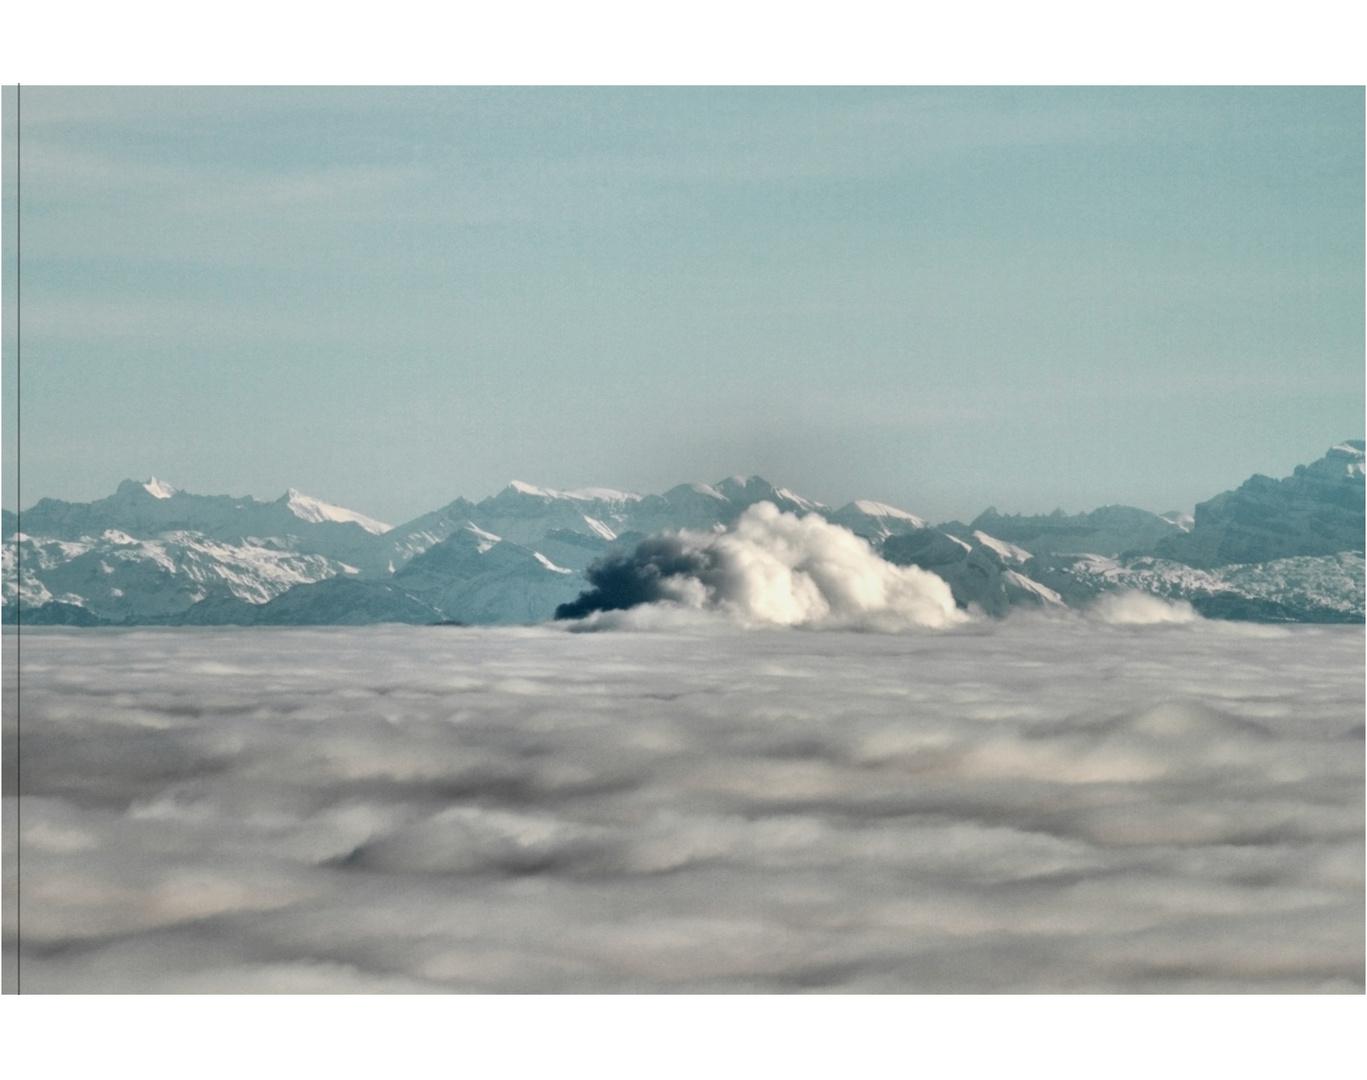 Belchen 2 - eruption II